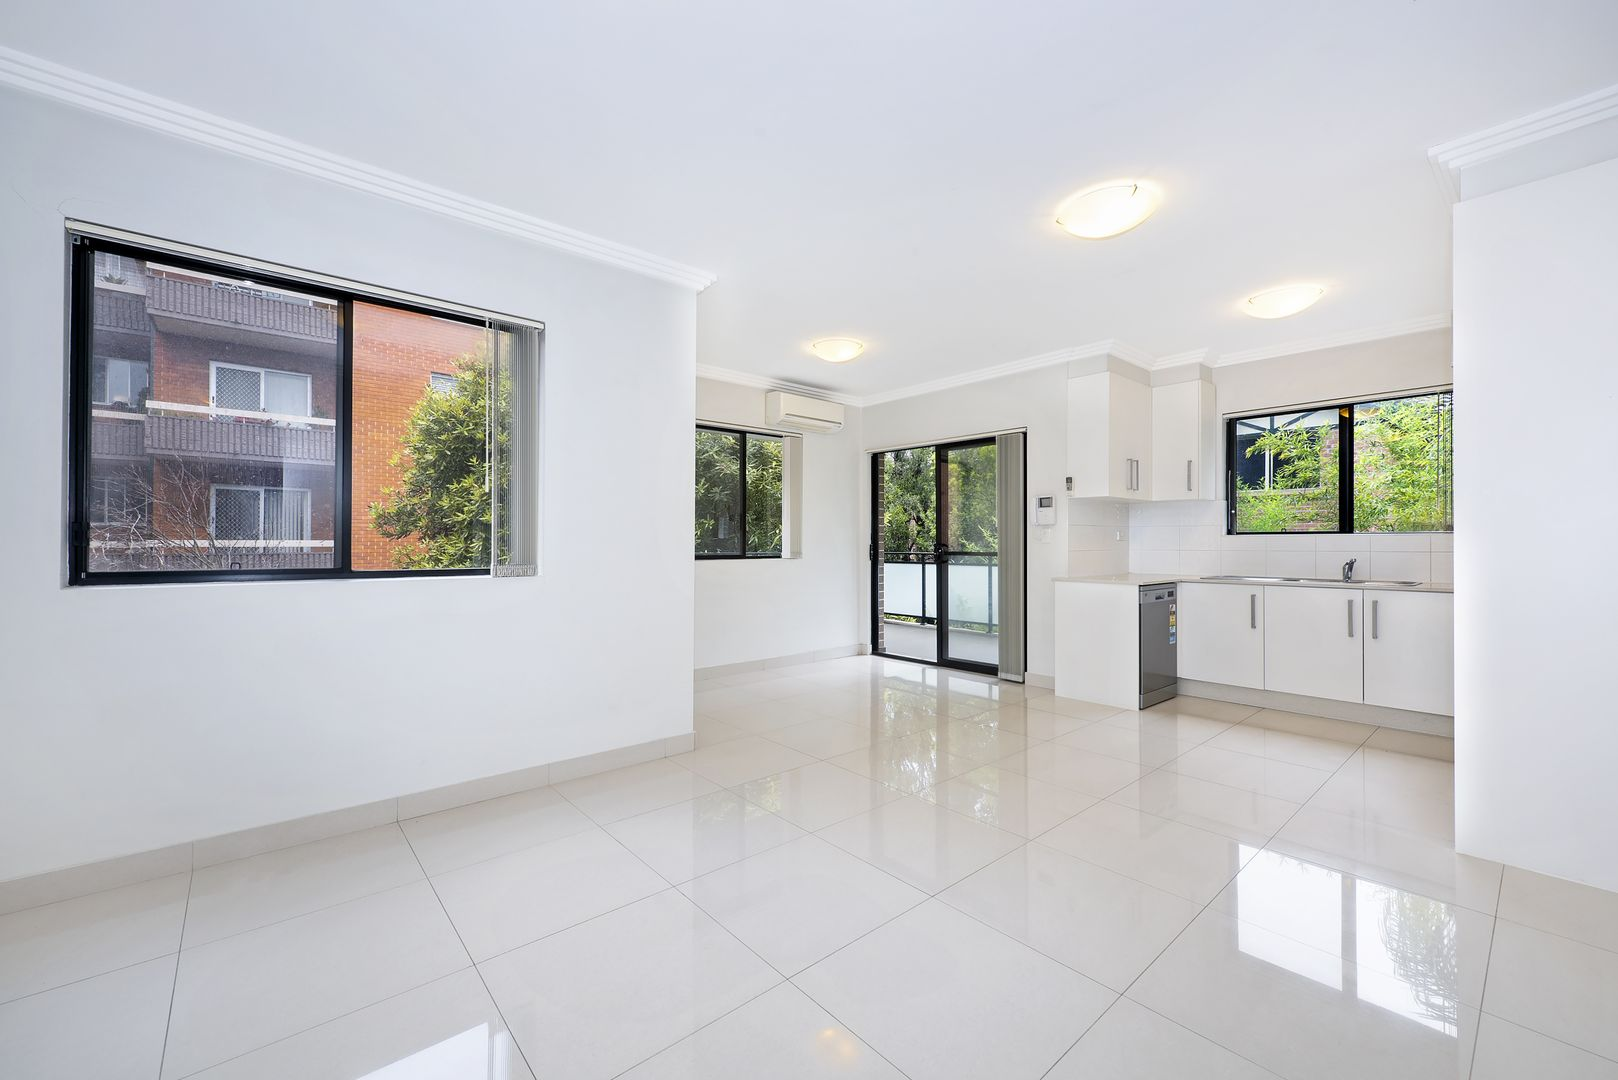 10/8-10 Ewart Street, Marrickville NSW 2204, Image 1